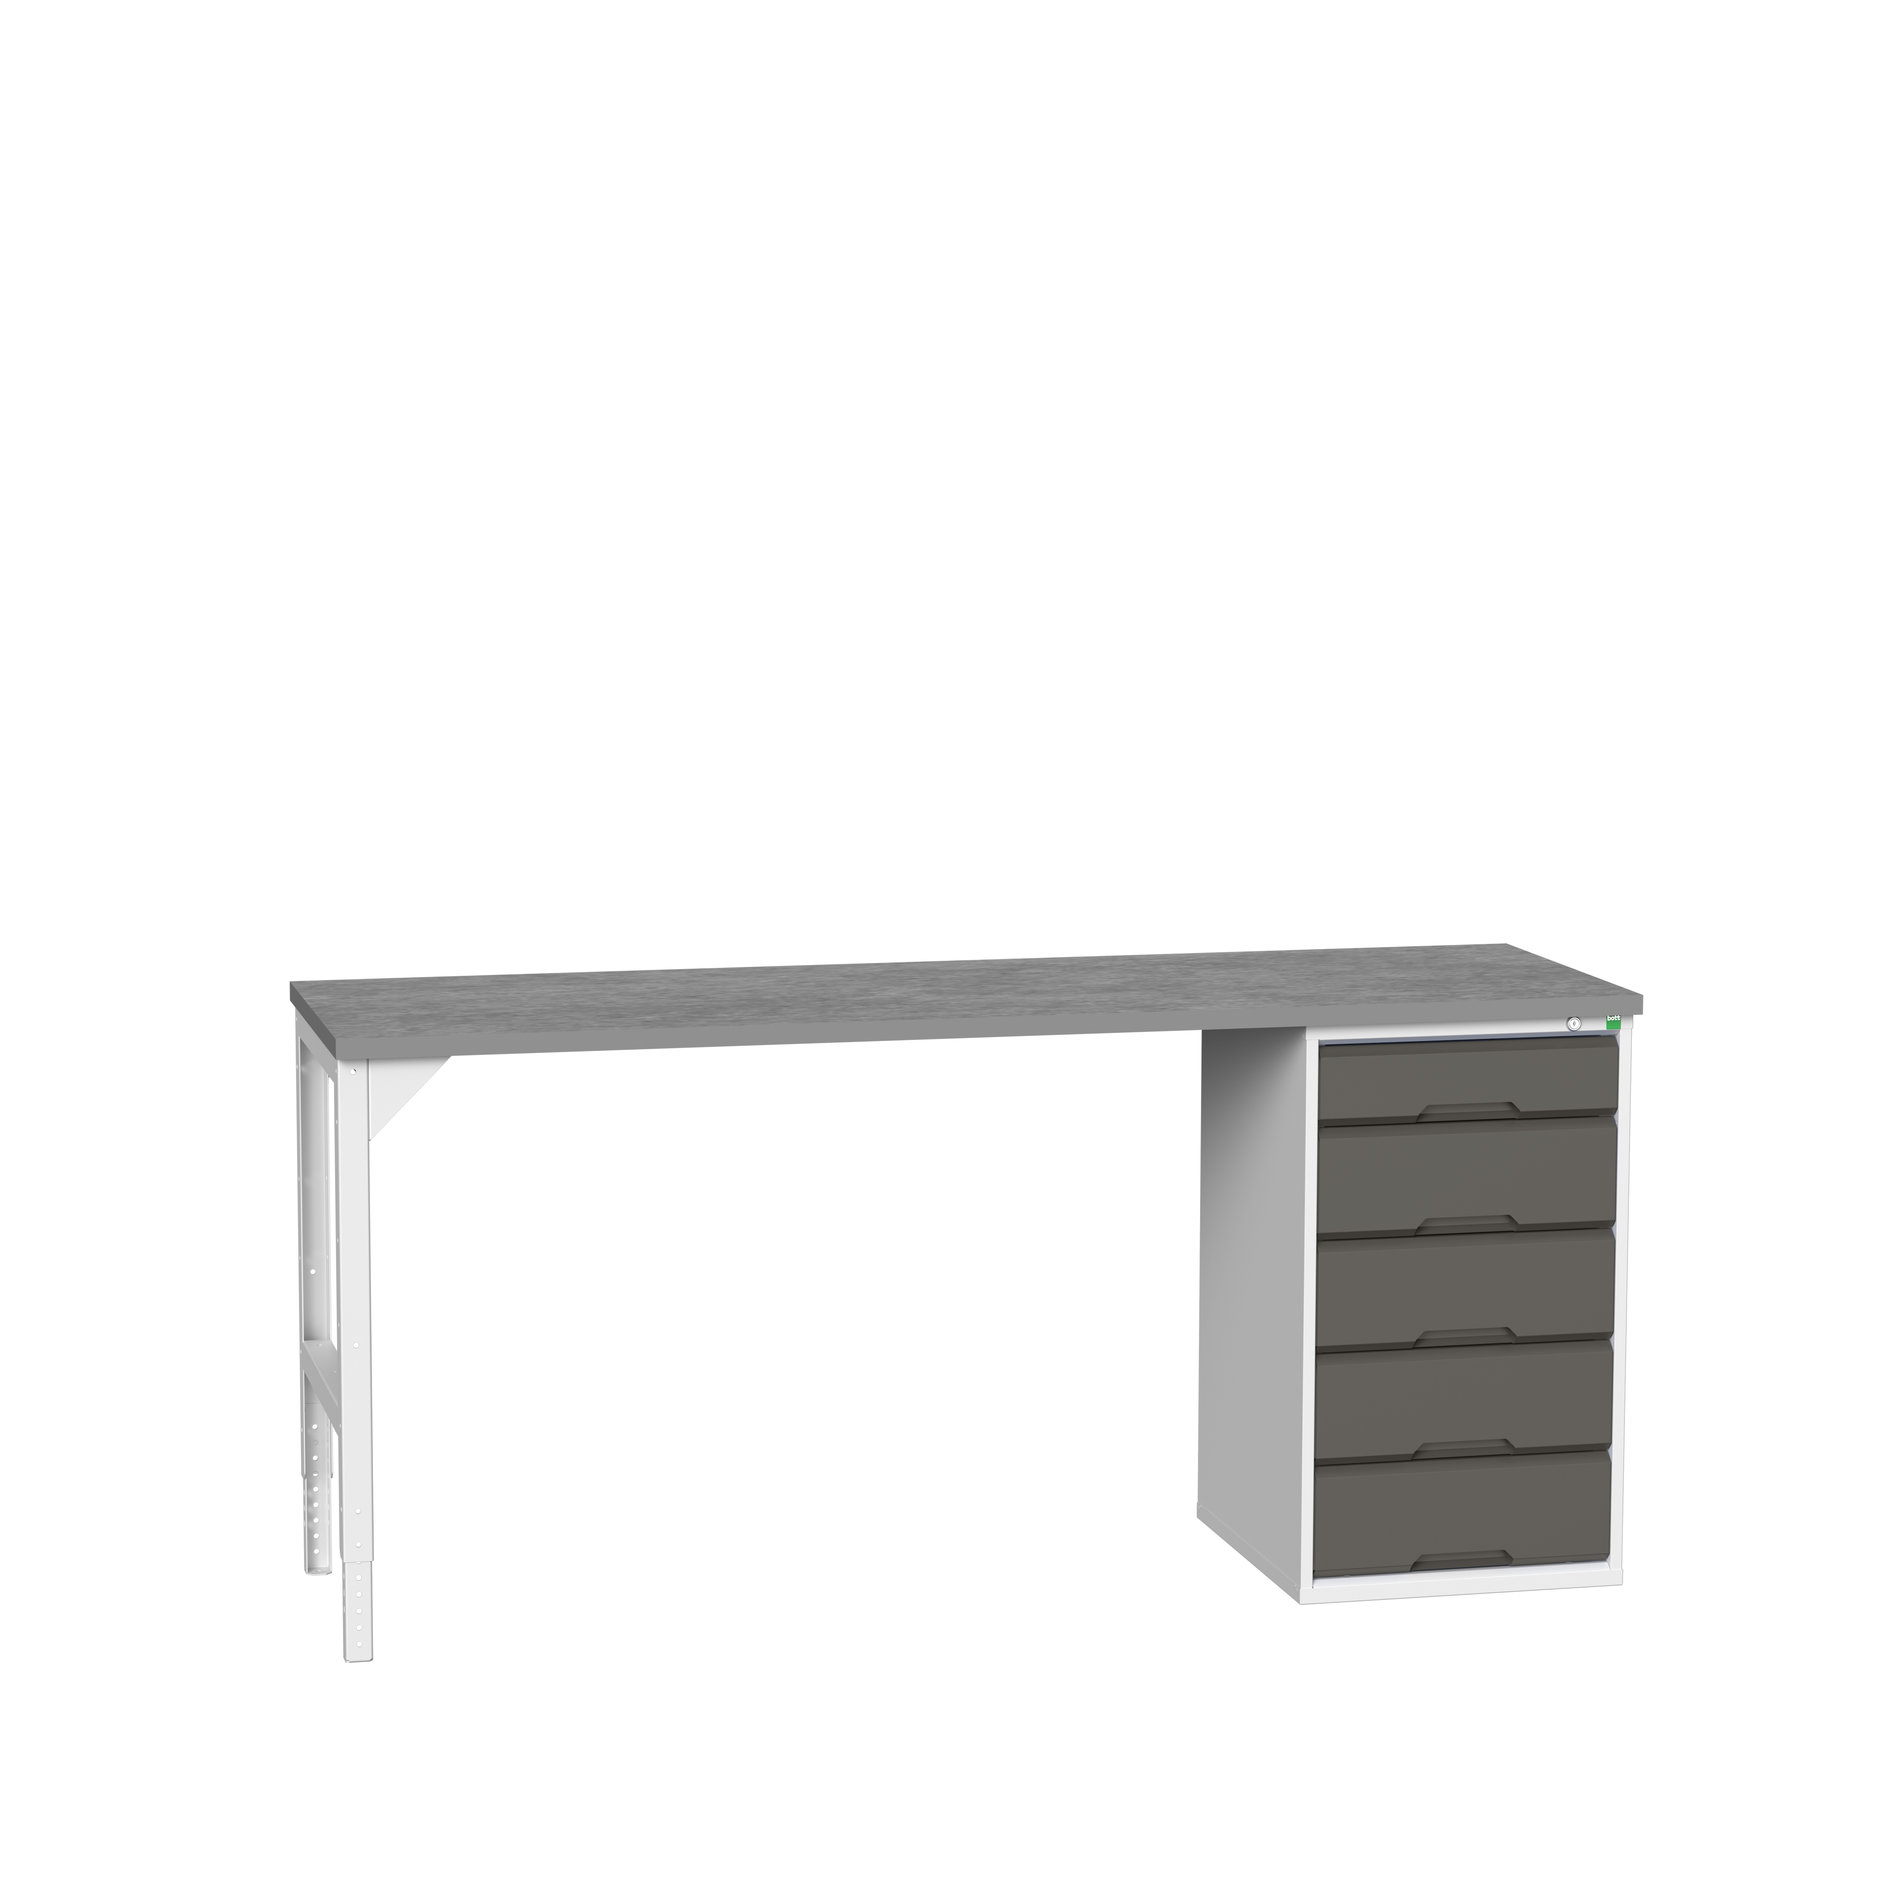 Bott Verso Pedestal Bench With 5 Drawer Cabinet